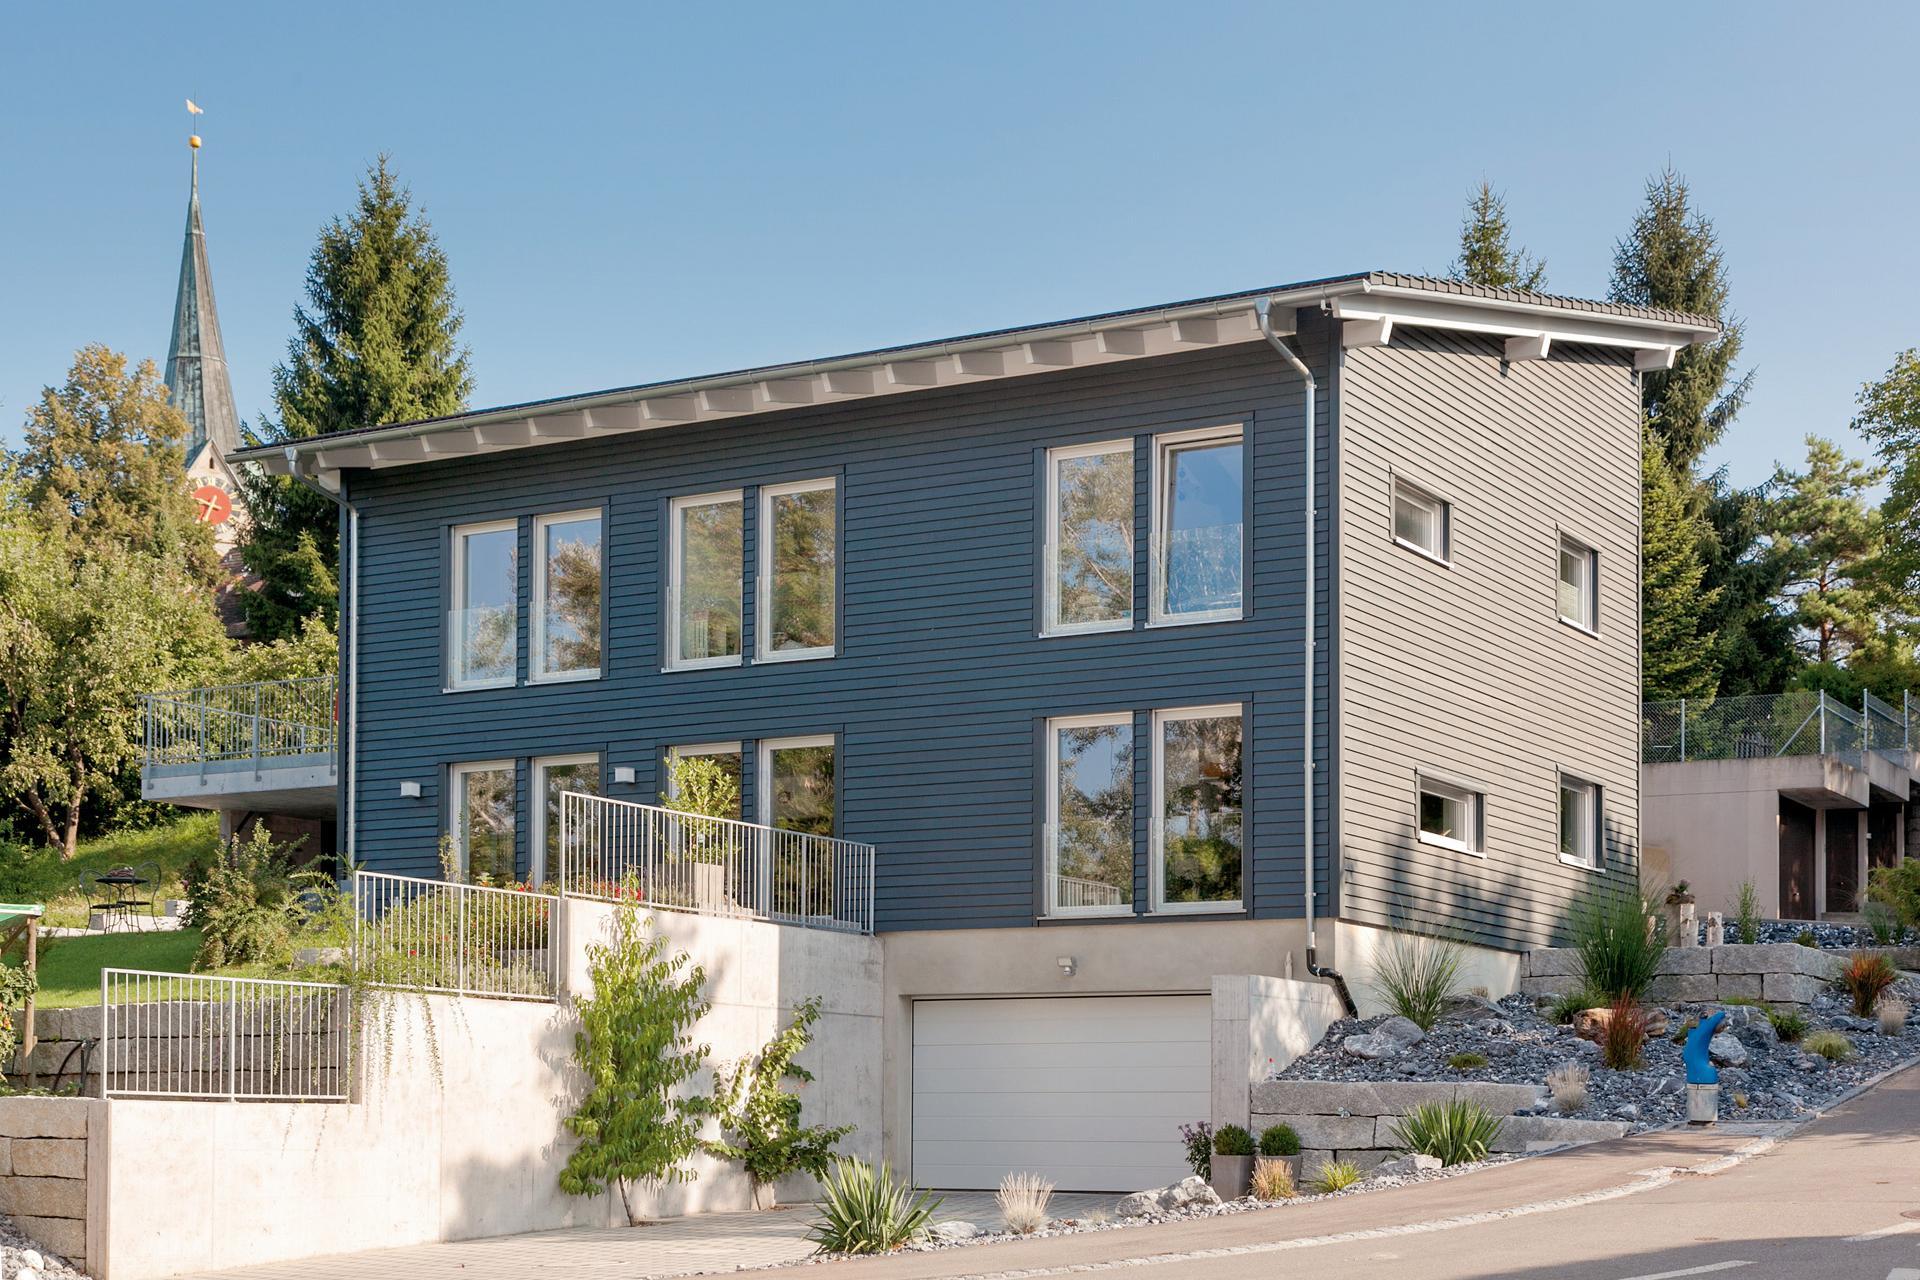 Moderna casa a risparmio energetico e 20 196 1 - Risparmio energetico casa ...